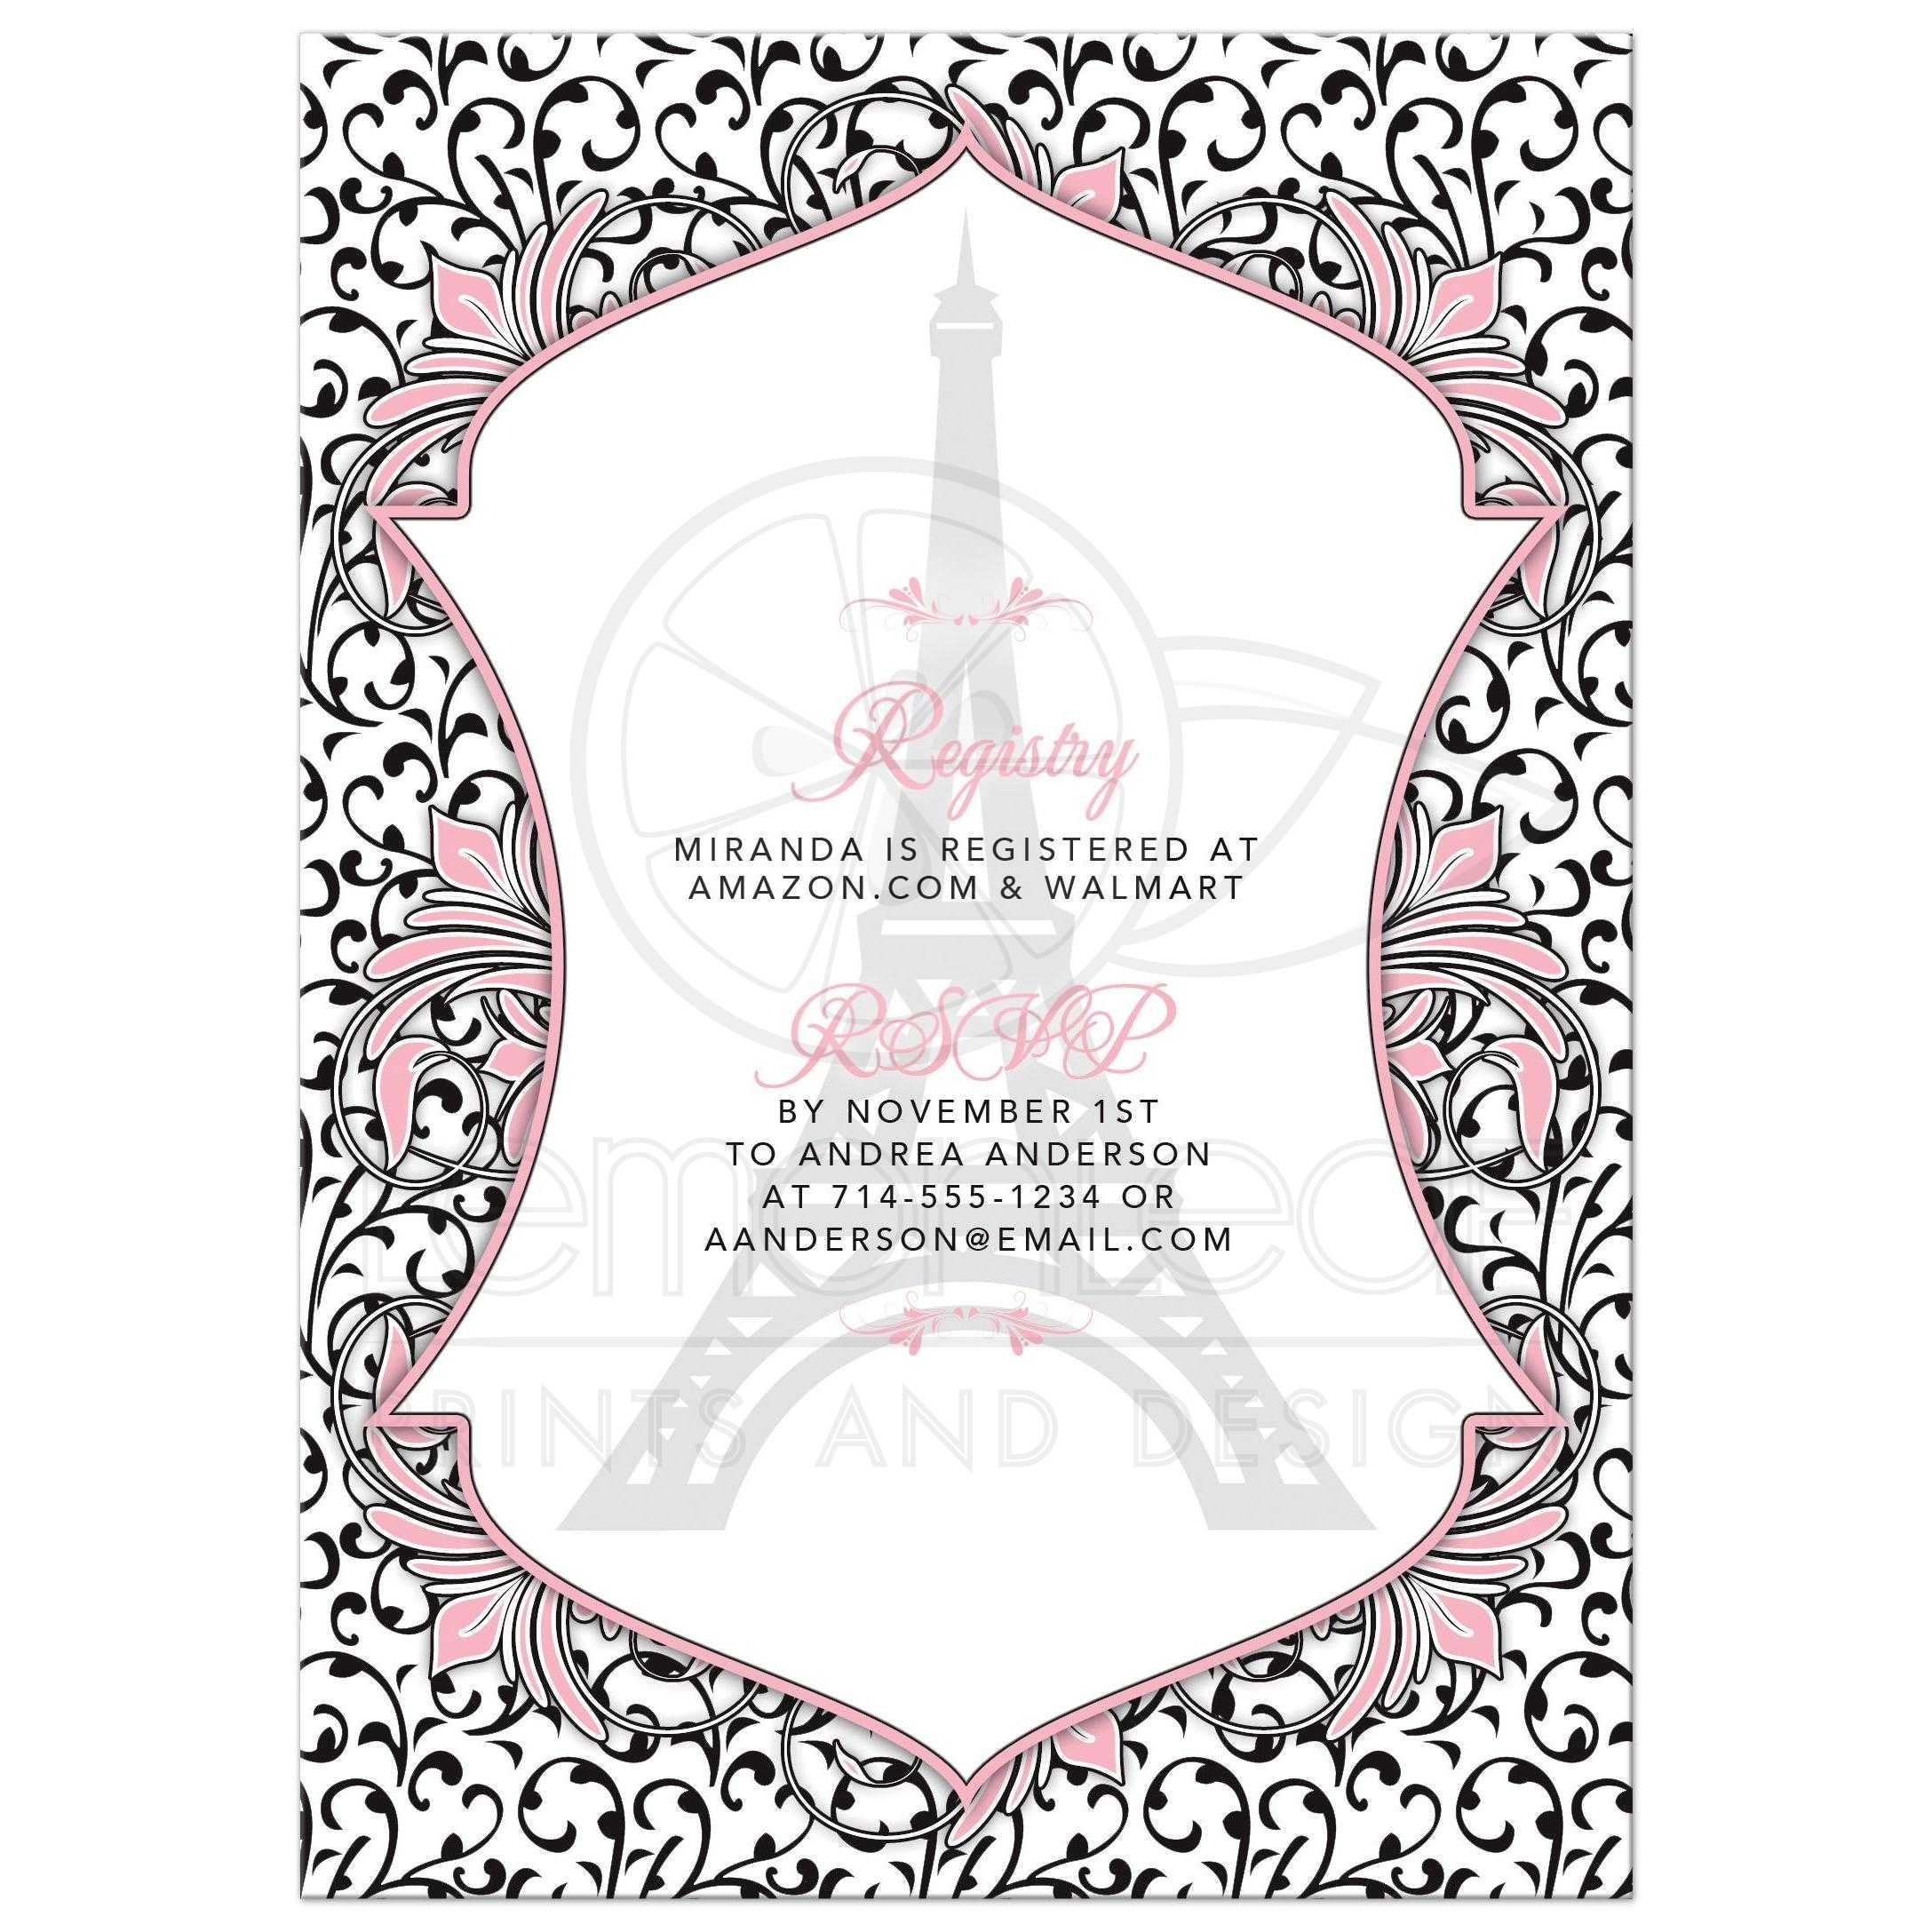 55a9c75ab1db Parisian Paris Eiffel Tower Bridal Shower Invitation Pink Black ...